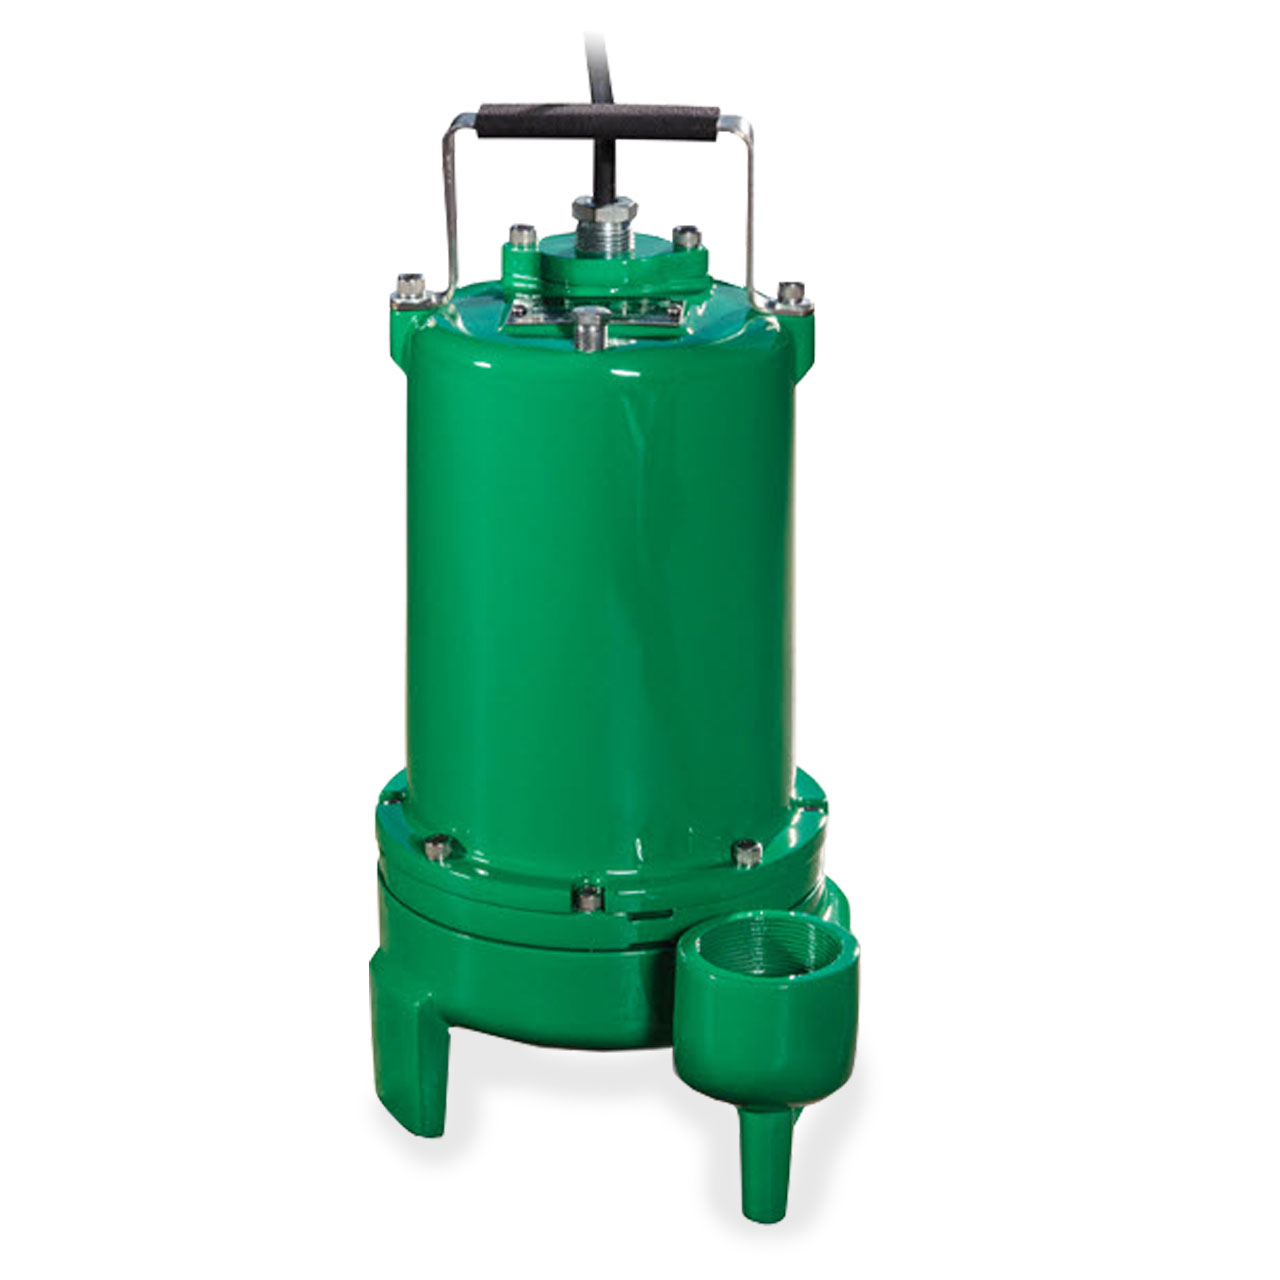 Myers Vrs10m 21 Vr1 Residential Submersible Grinder Pump 10 Little Giant Wiring Diagram Hp 230v 1 Ph Manual 20 Cord Myr28172d003